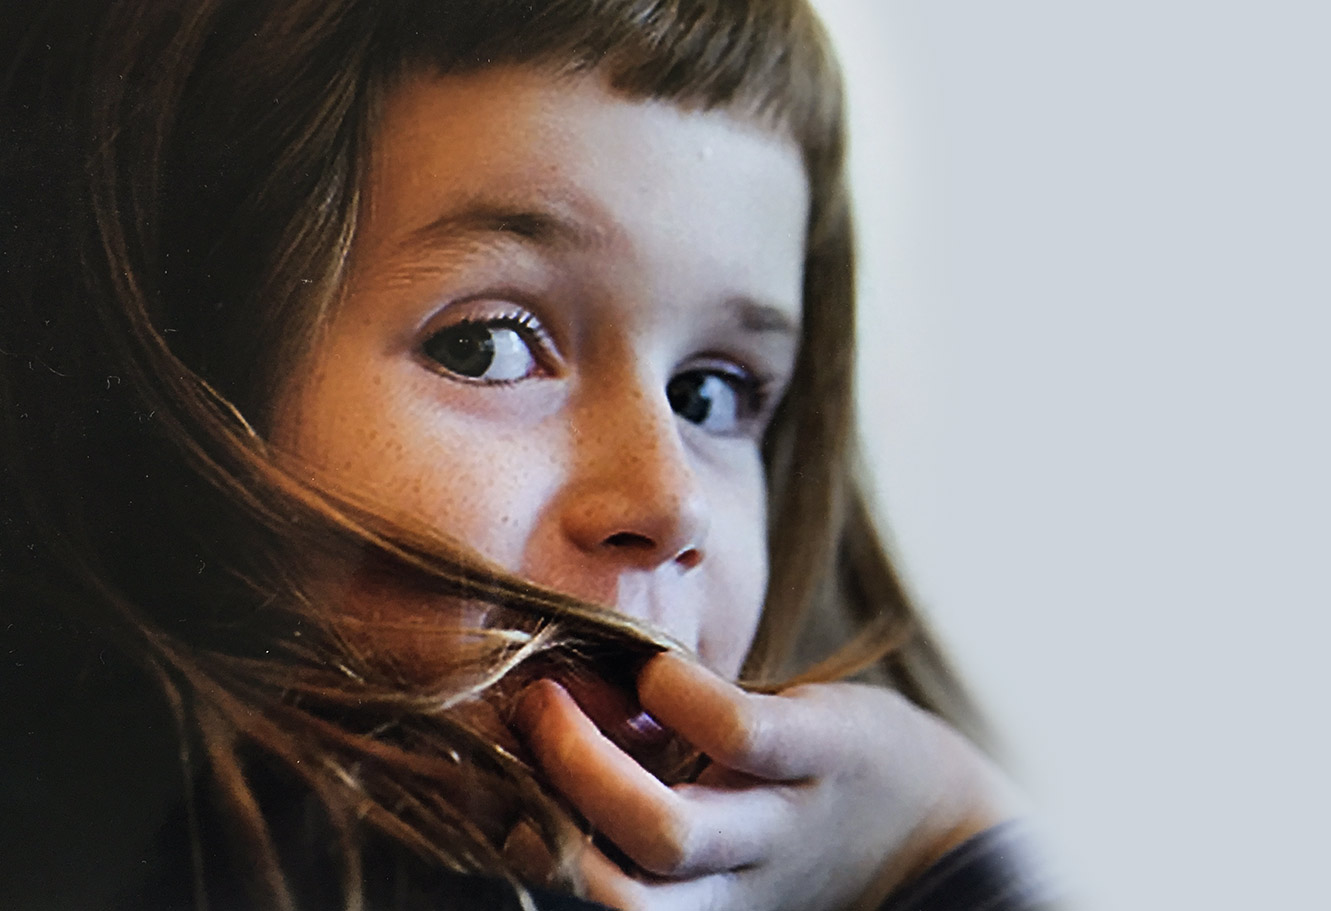 Pediatric brain tumor survivor talks about talking with sick kids altavistaventures Choice Image